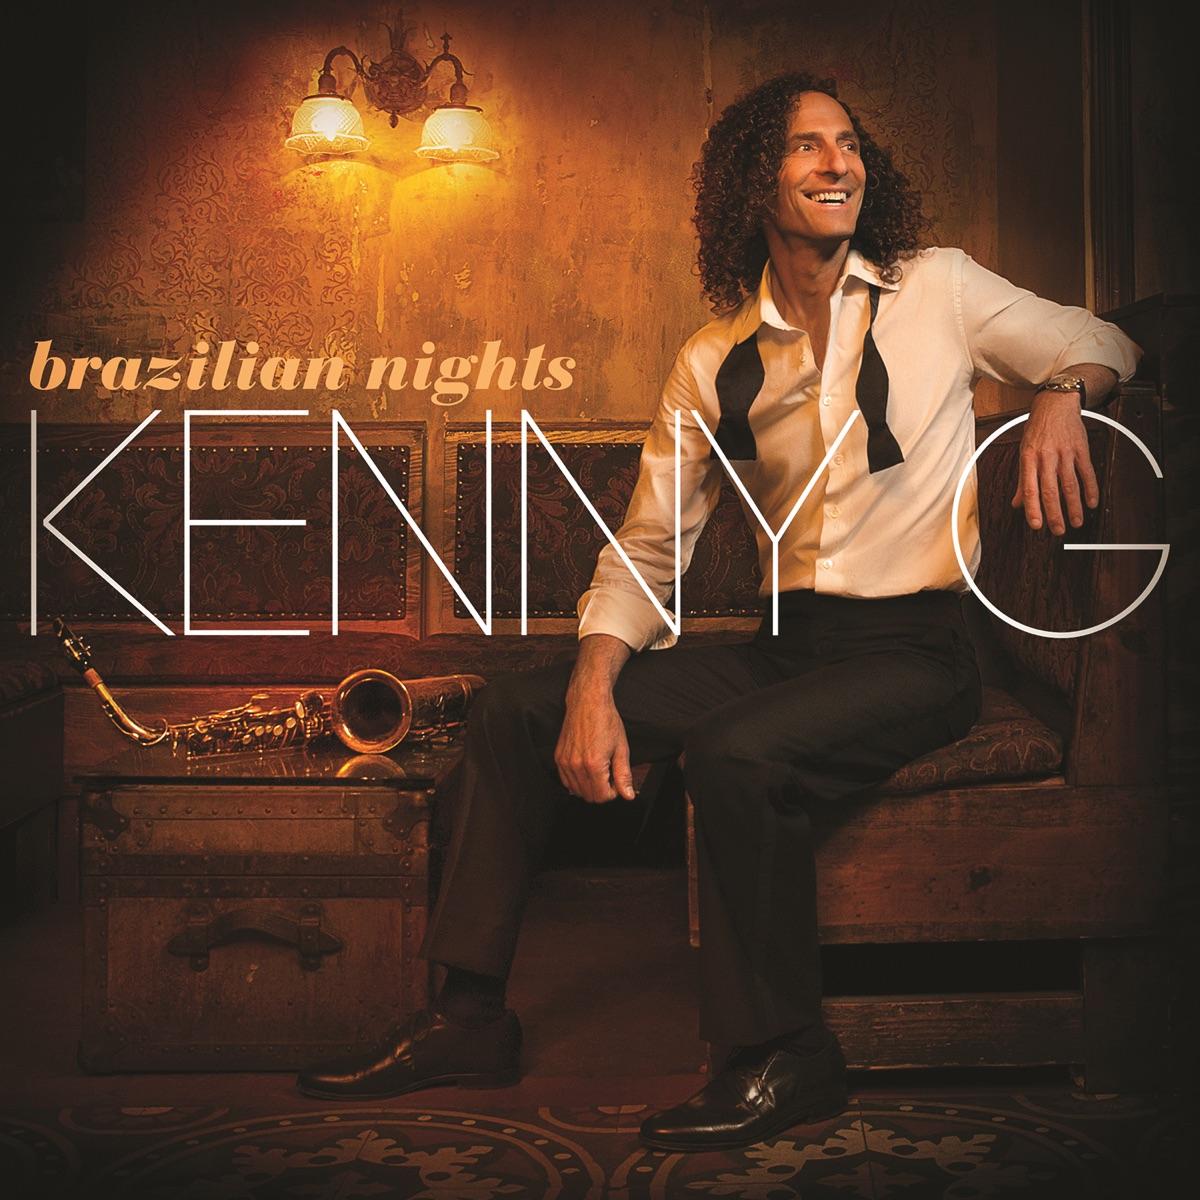 Brazilian Nights Album Cover by Kenny G